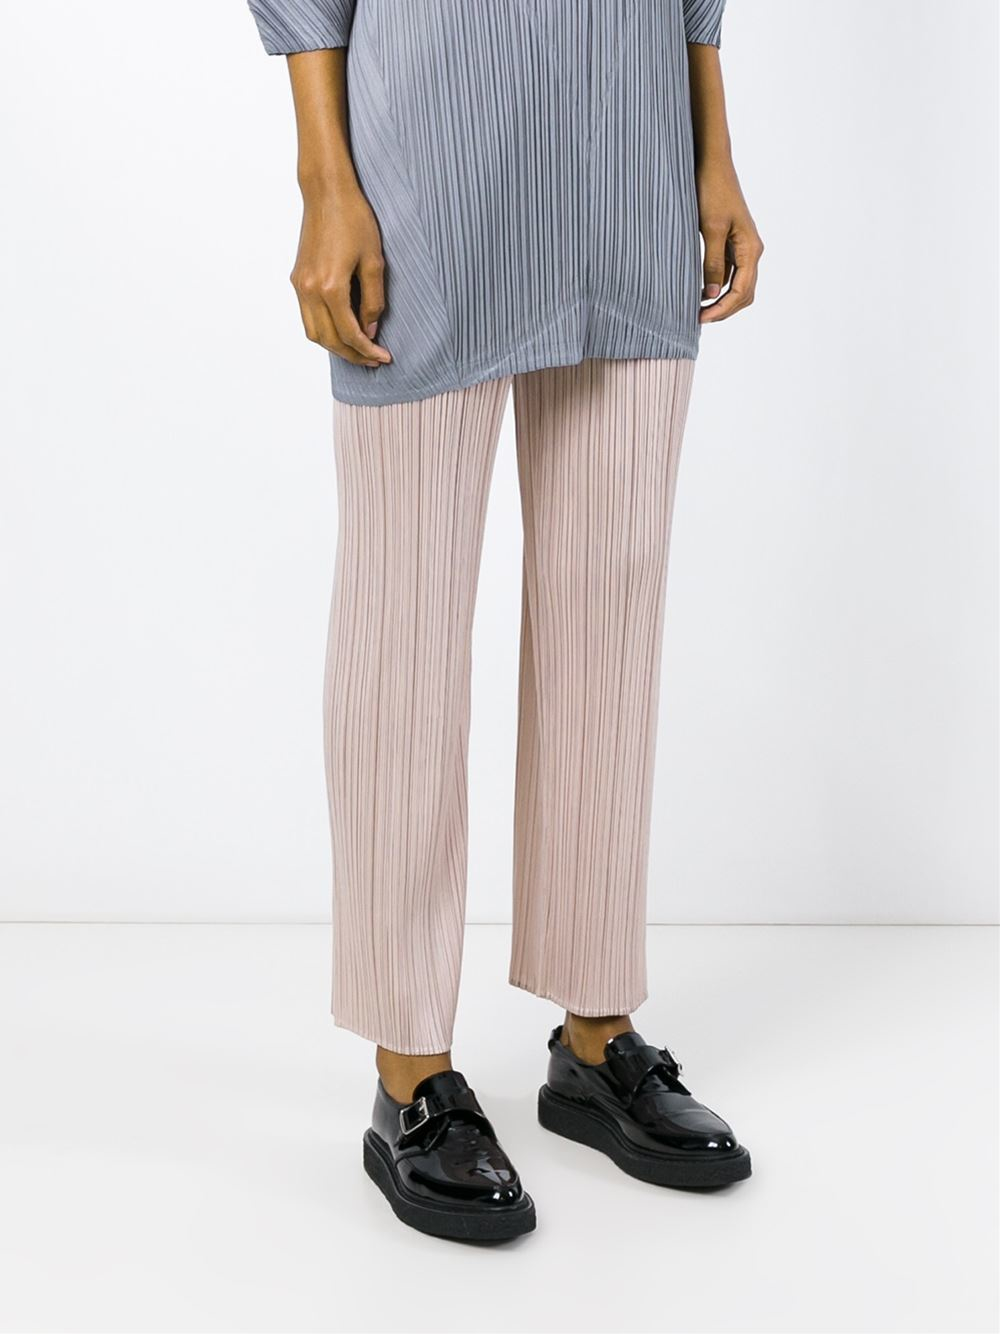 Flattering Jeans For Women